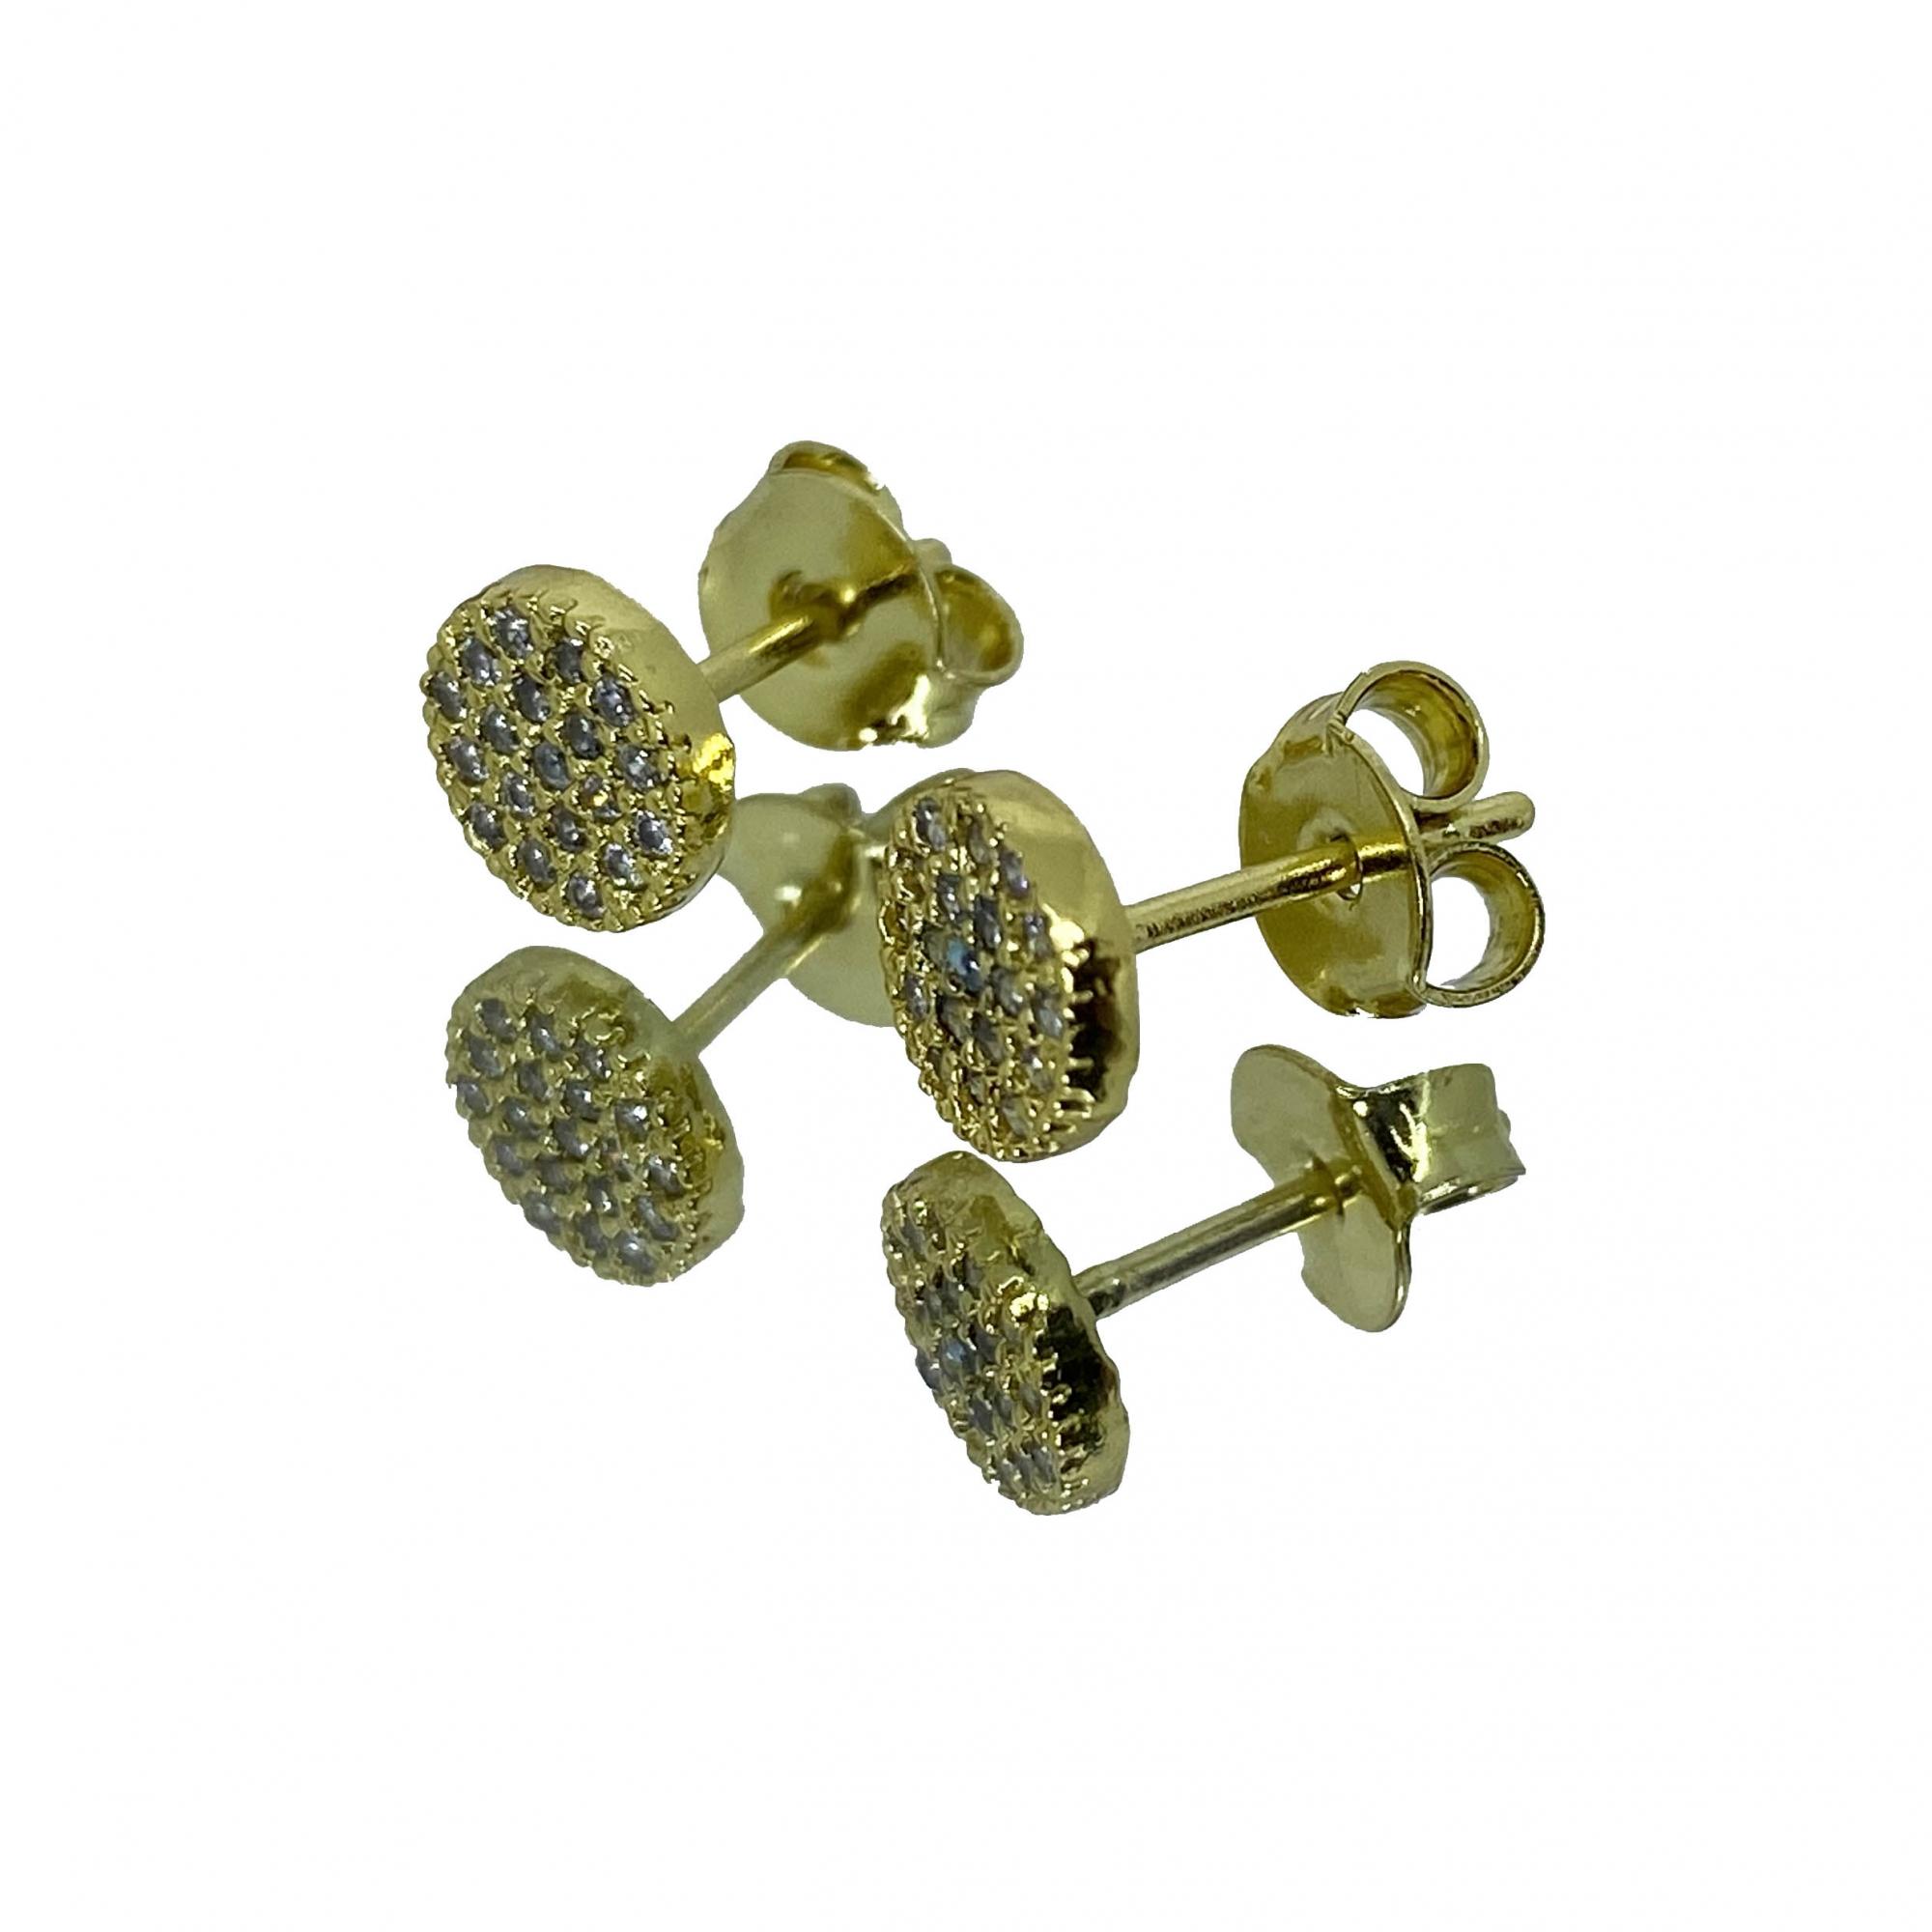 Brinco Redondo 14 pedras (1,5g) 6x6mm (Banho Ouro 18k)